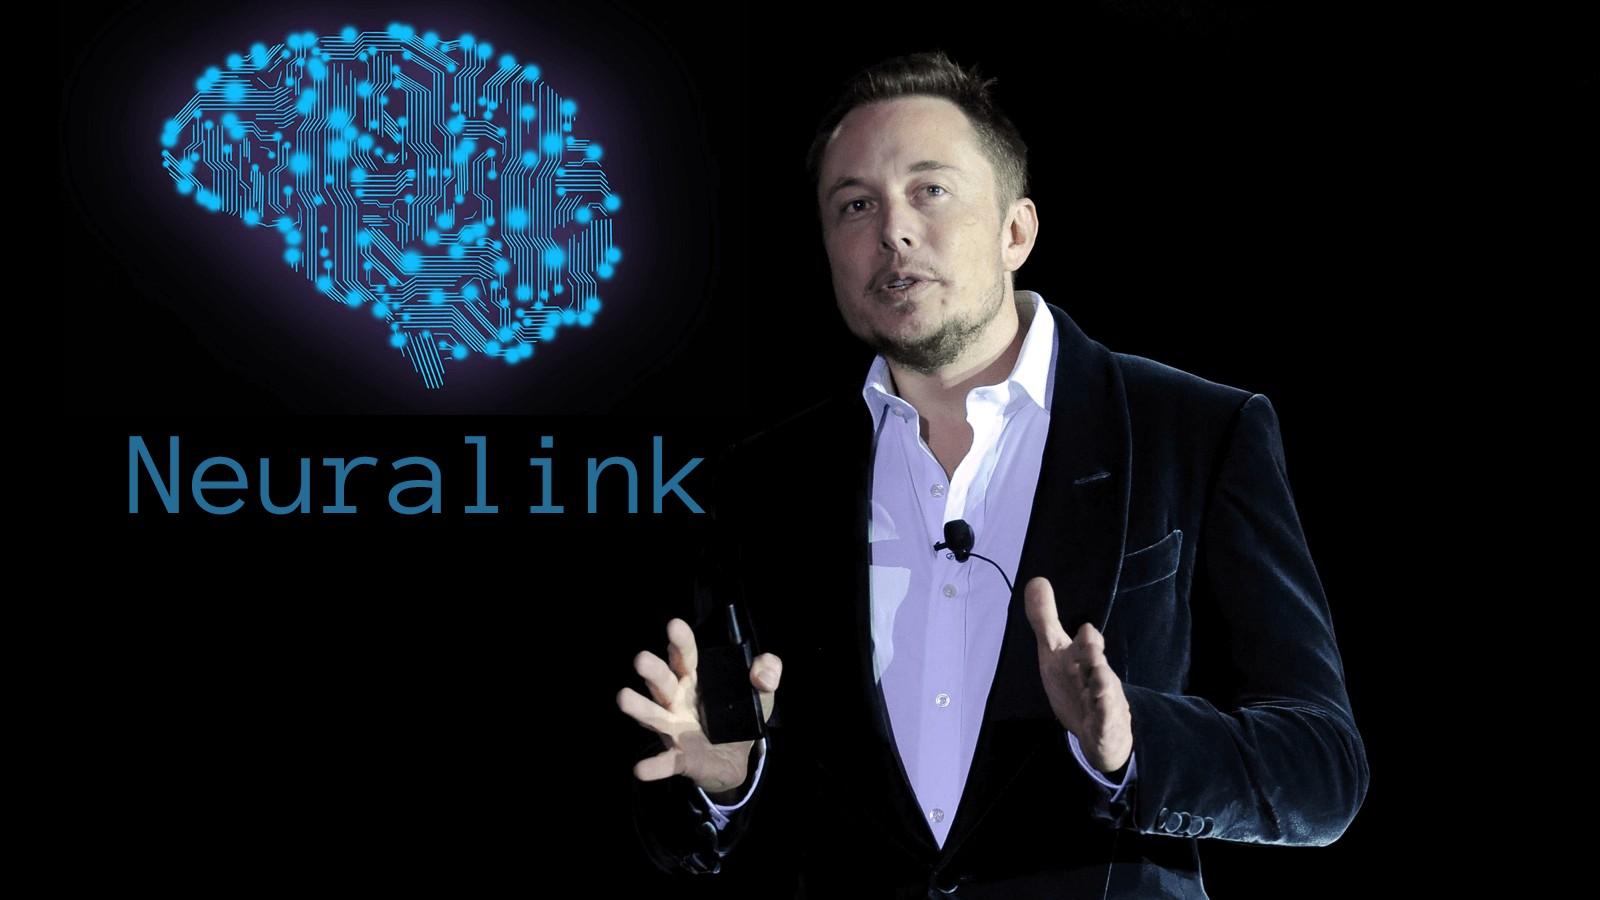 Neuralink e o ambicioso plano de Elon Musk para criar uma interface cérebro-máquina